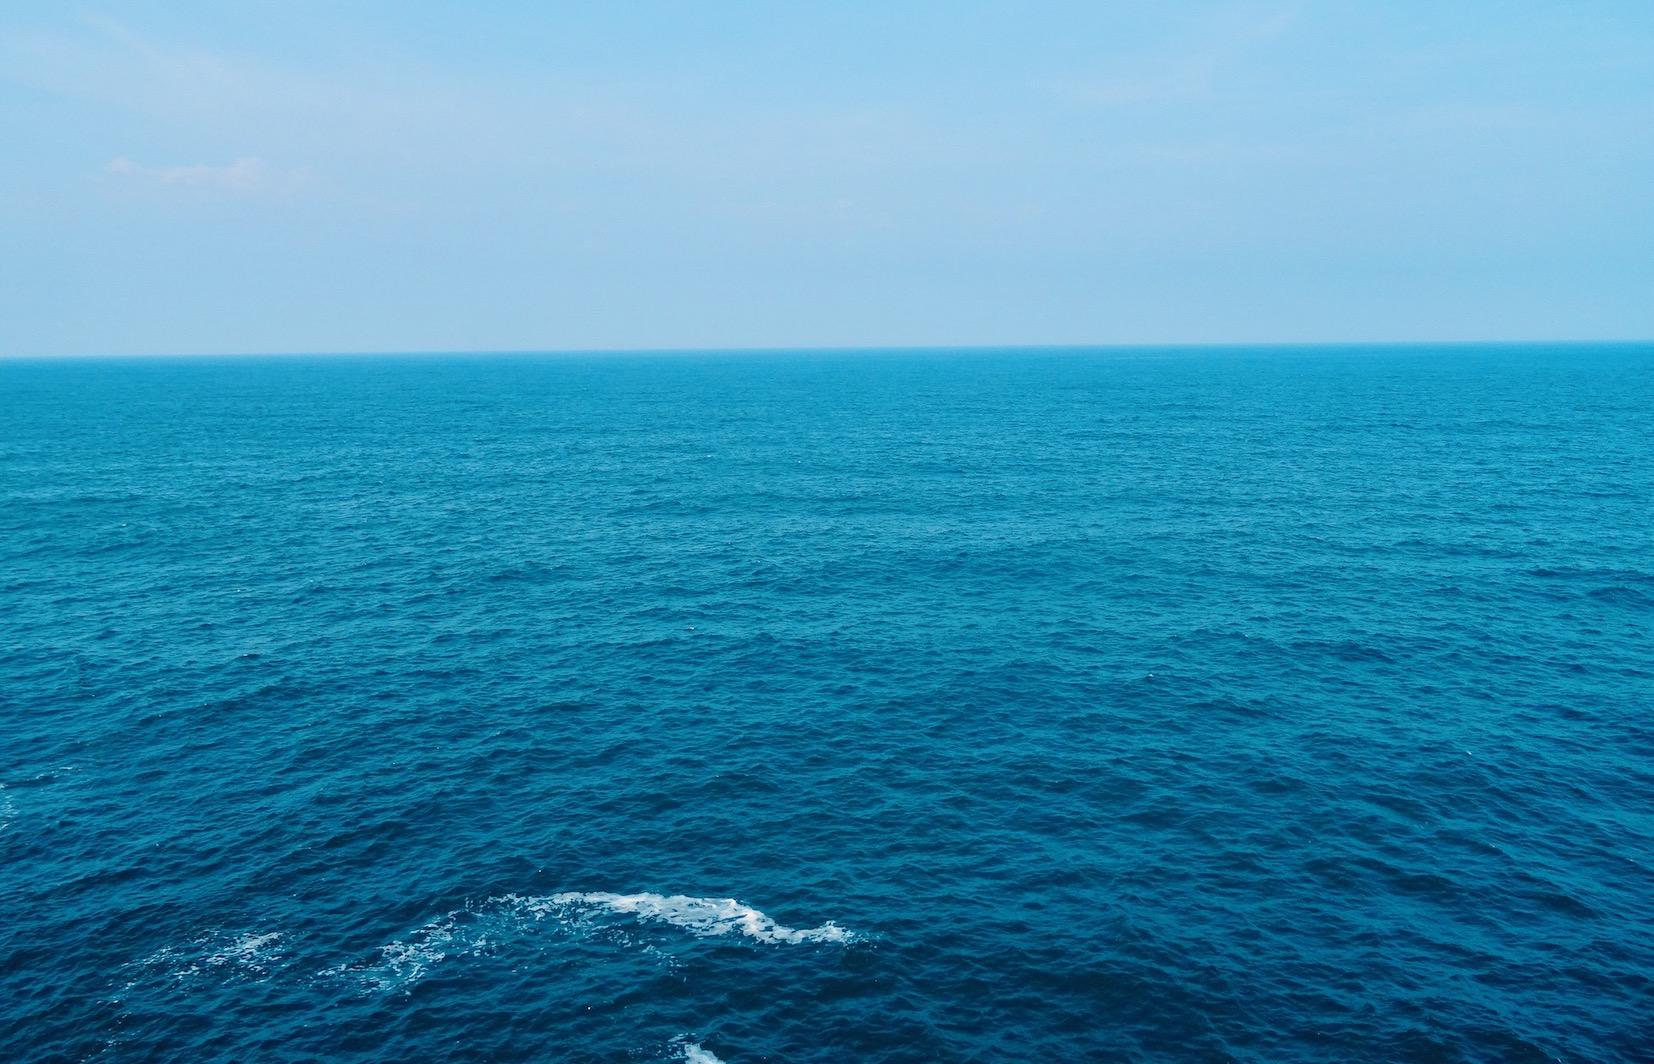 The Cantabrian Sea.